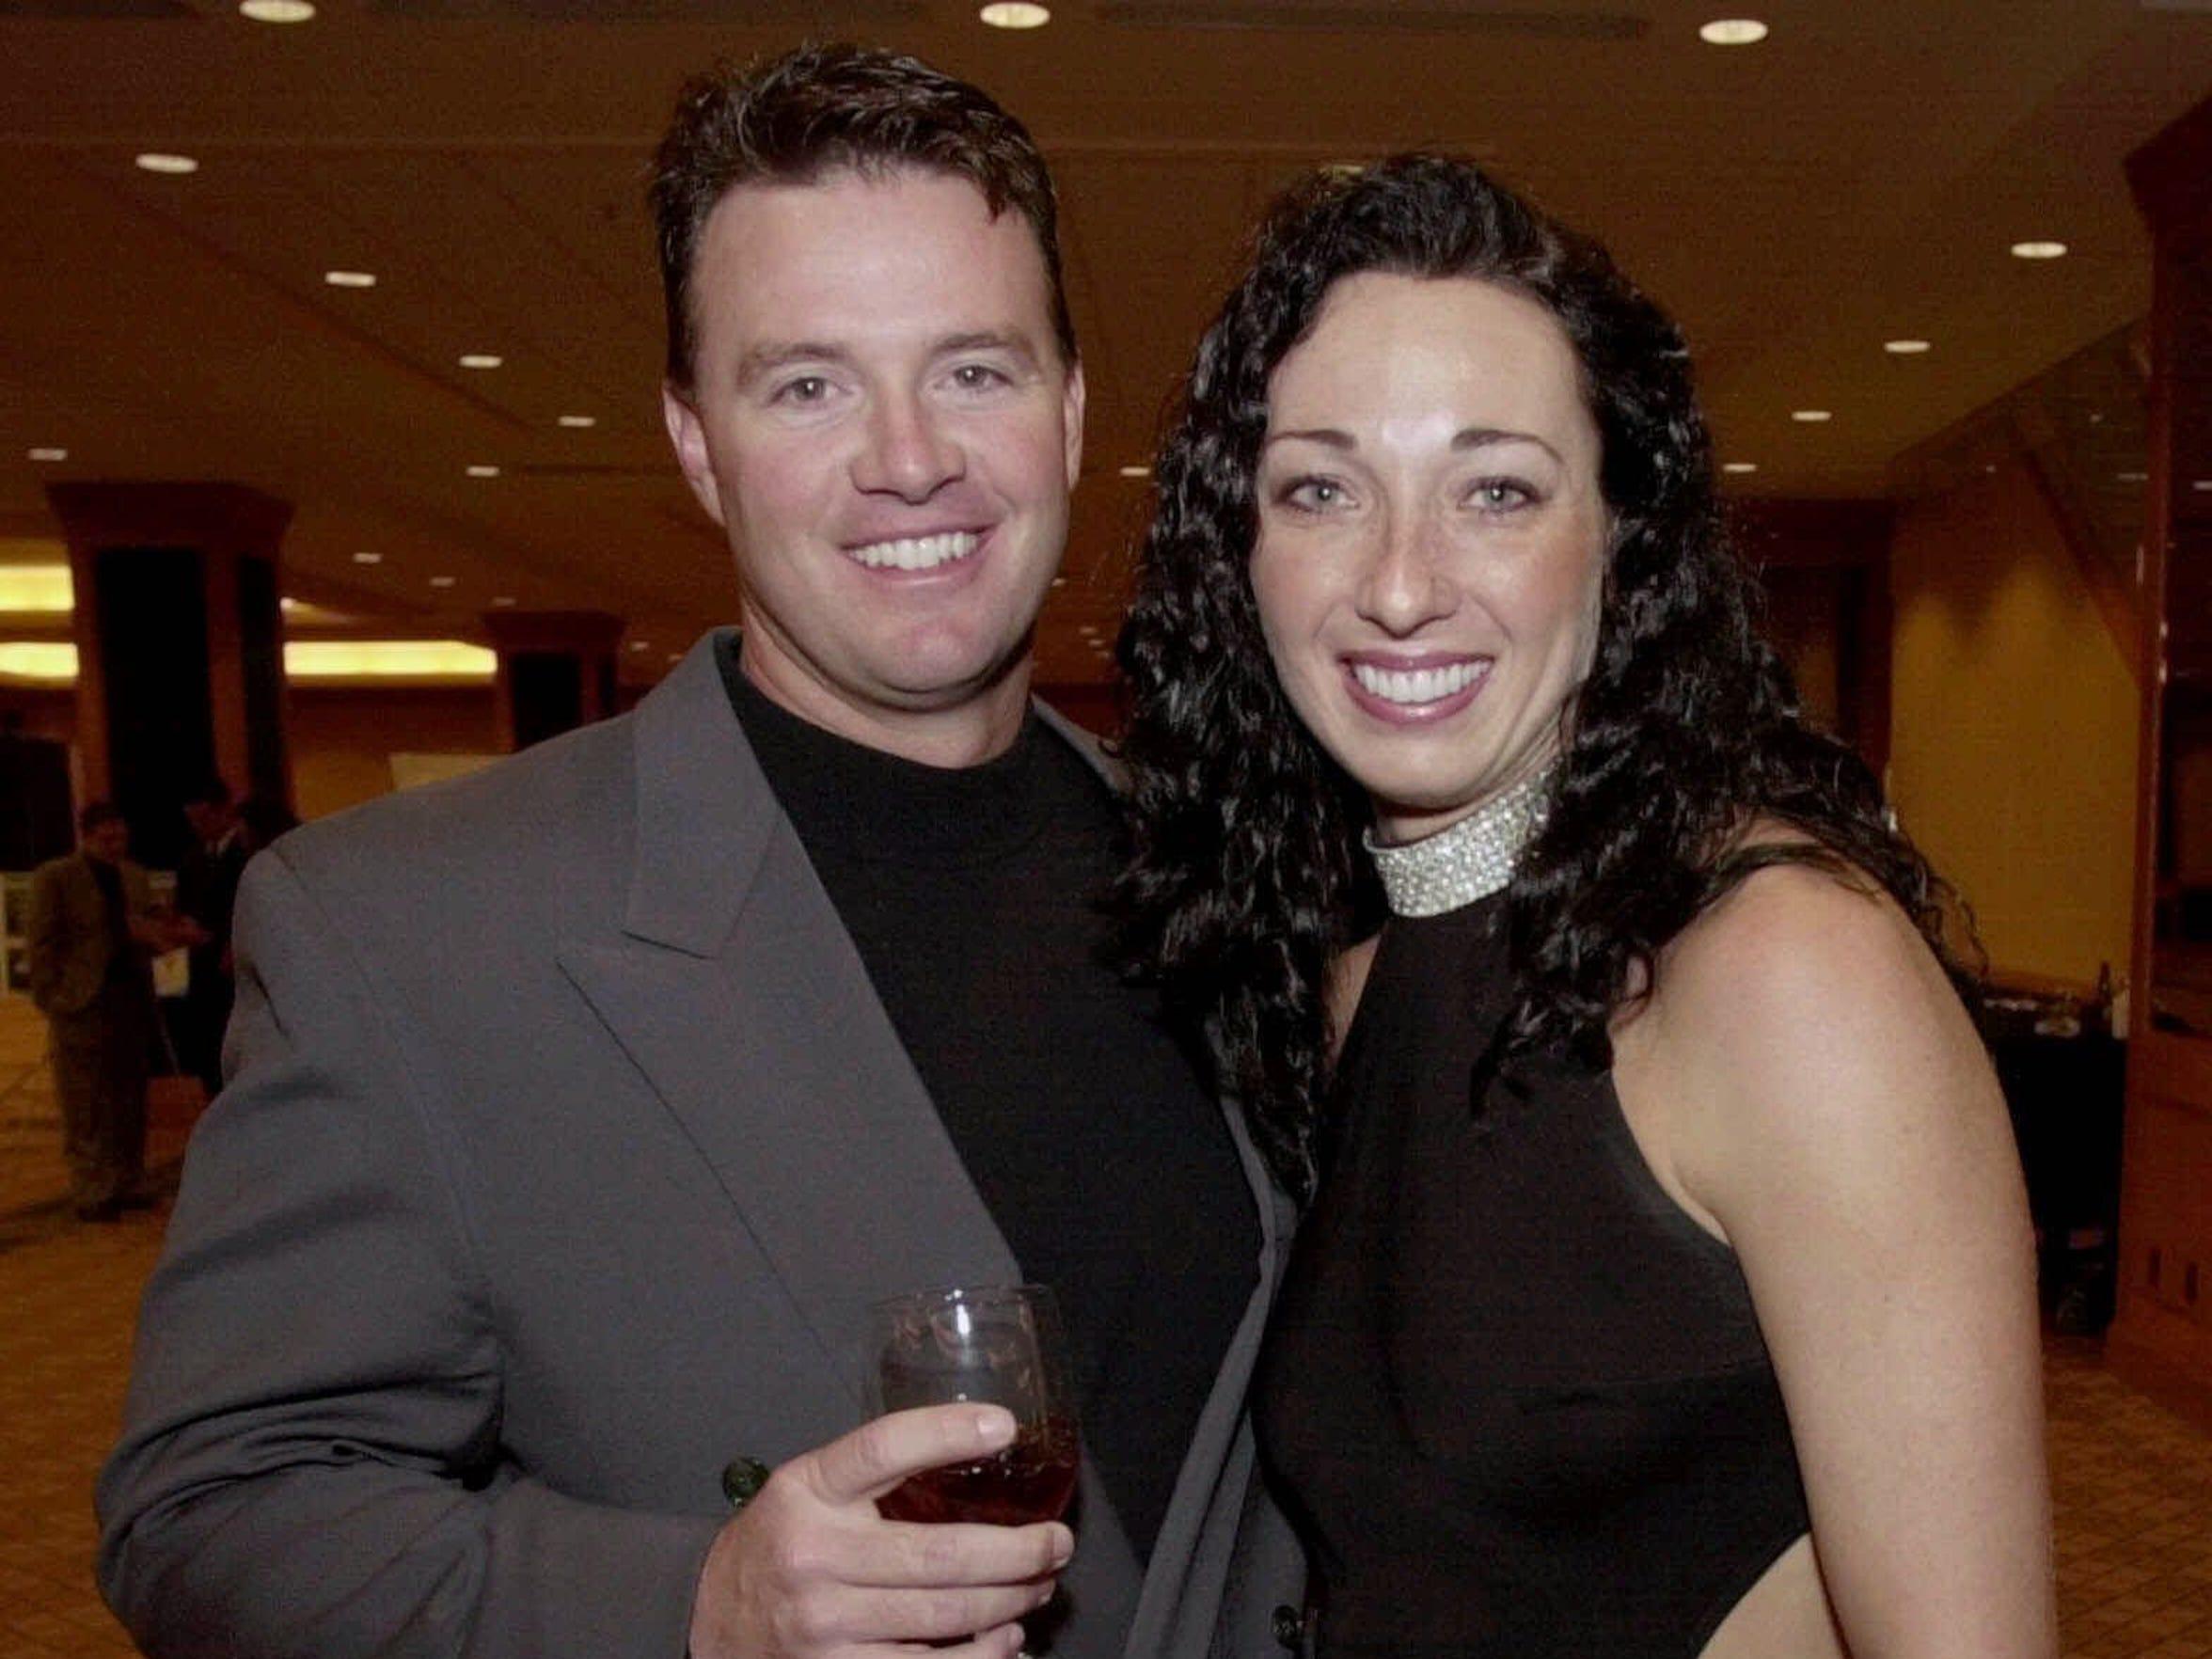 A team: Amy Van Dyken and Tom Rouen at a Colorado Sports